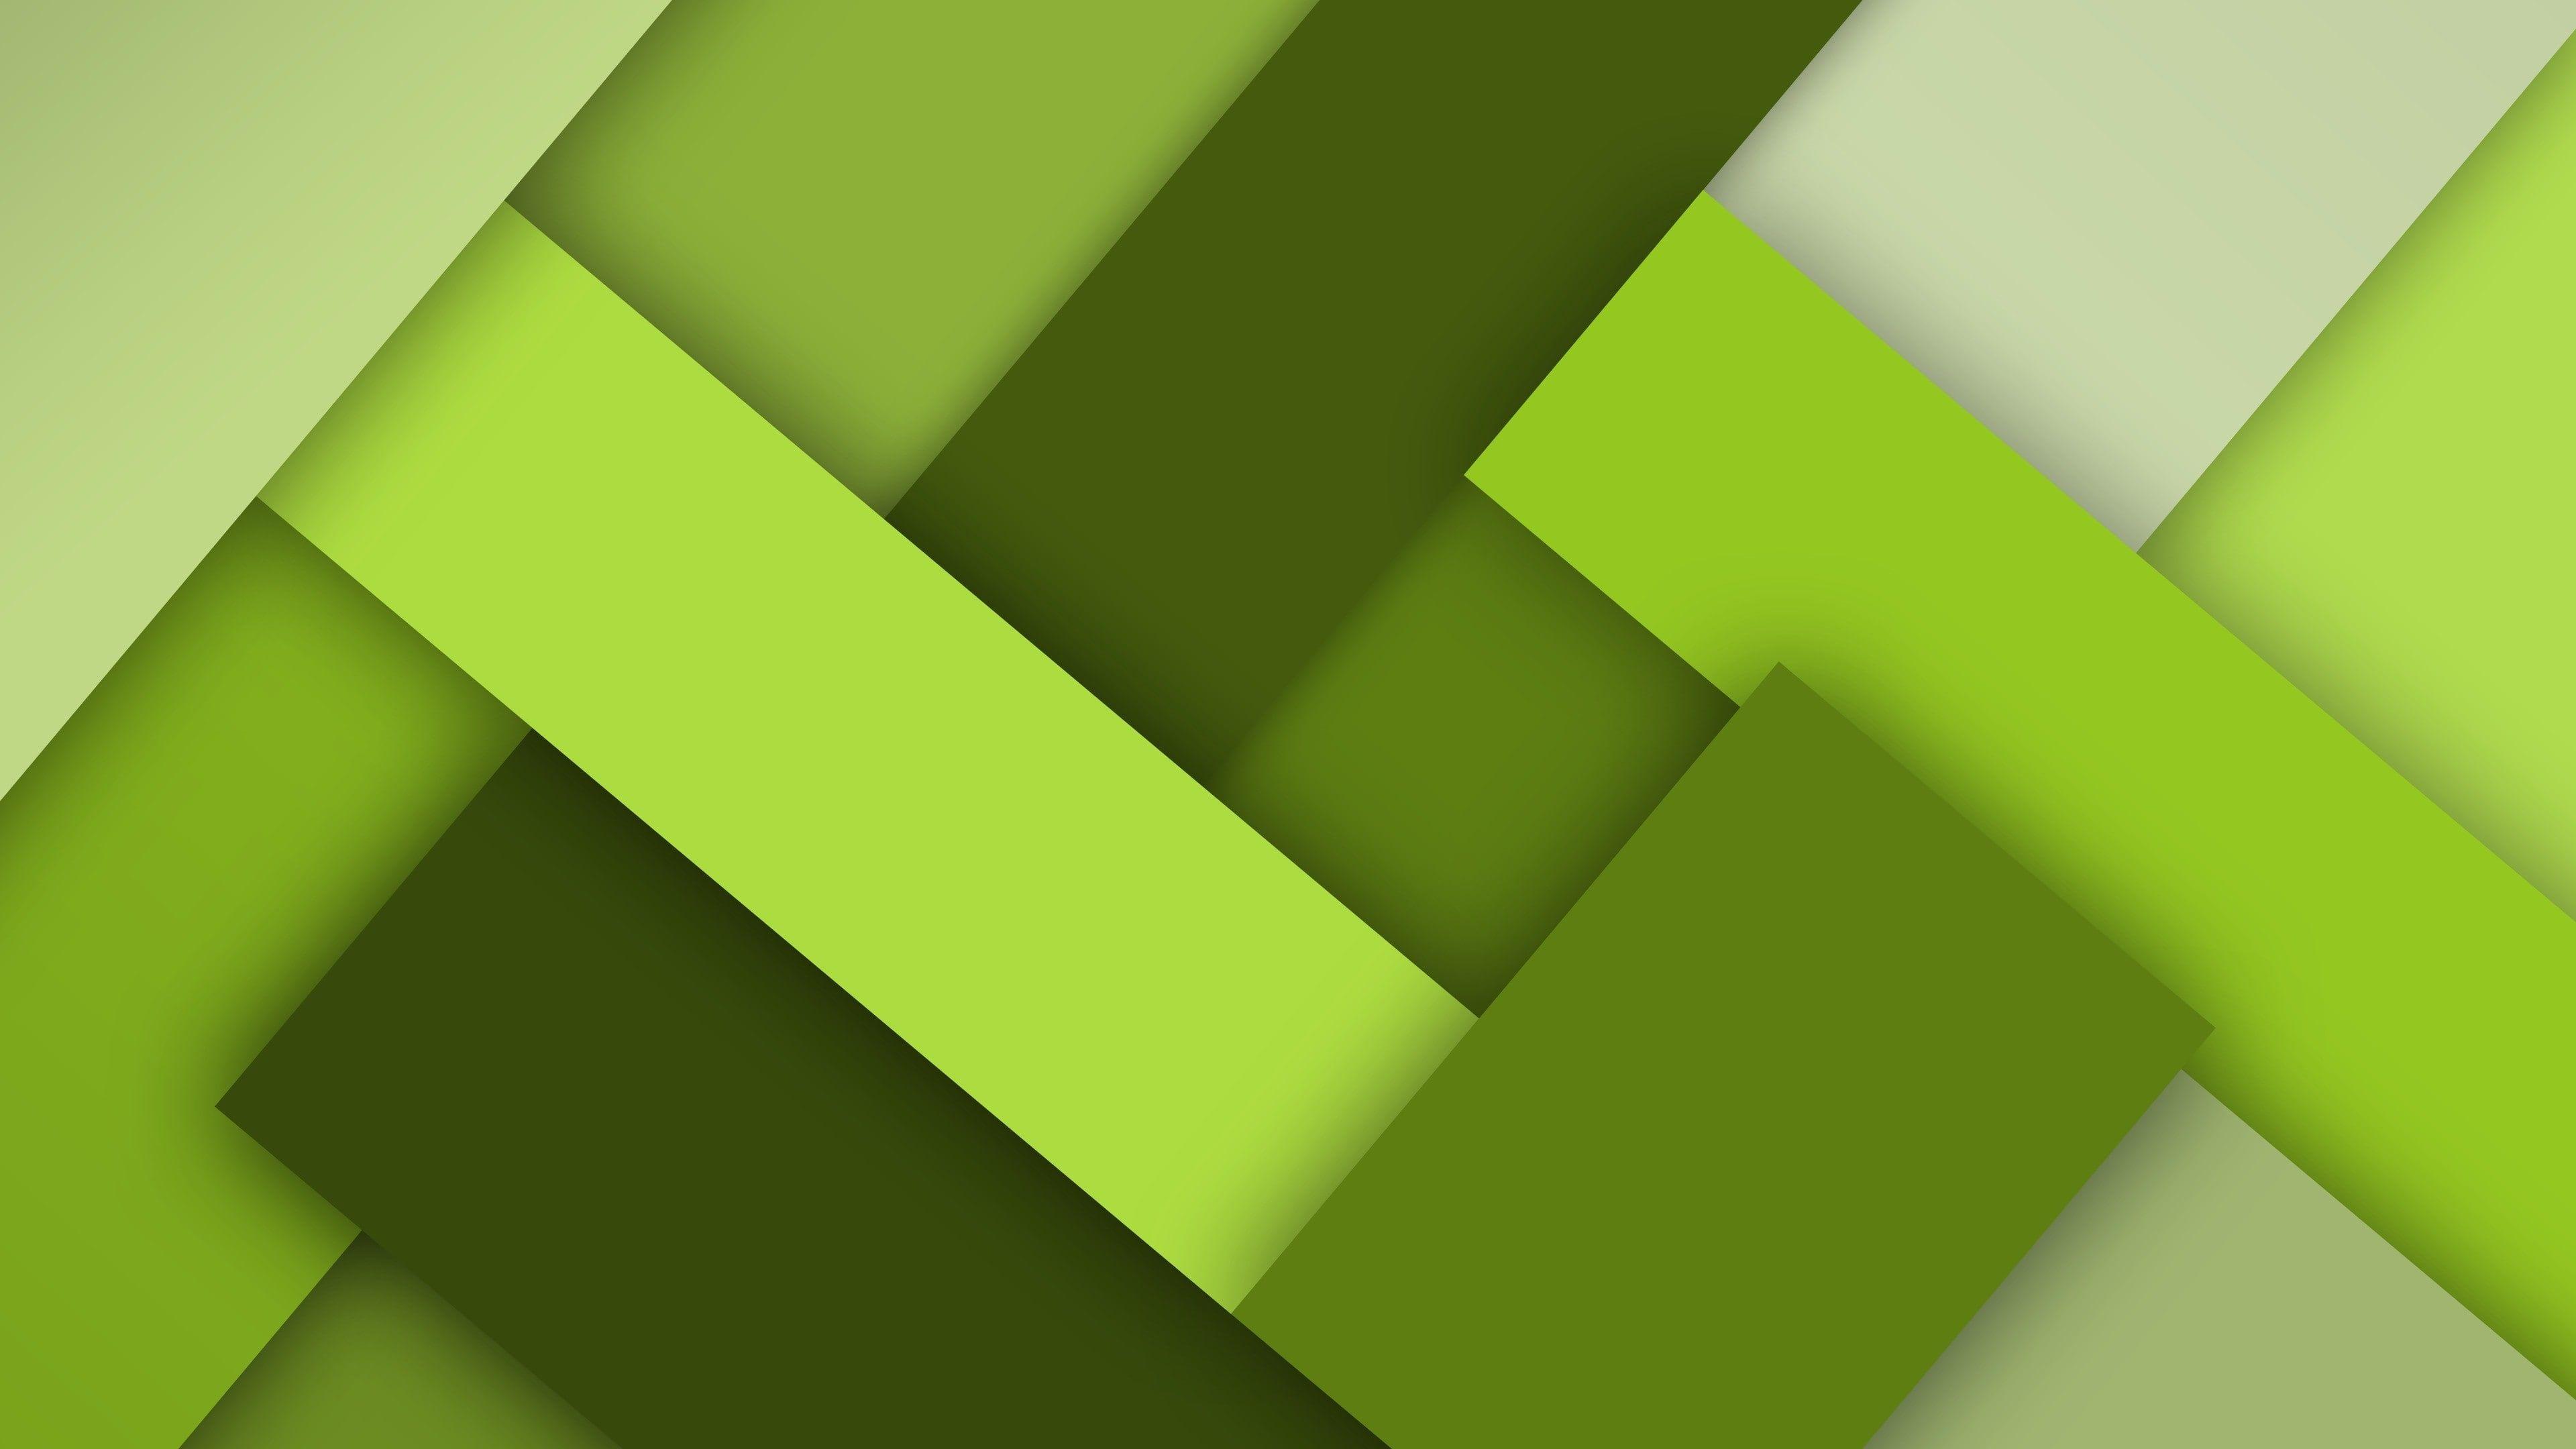 Green And White Wallpaper Pattern Artwork 4k Wallpaper Hdwallpaper Desktop In 2020 Background Hd Wallpaper Hd Wallpaper Abstract